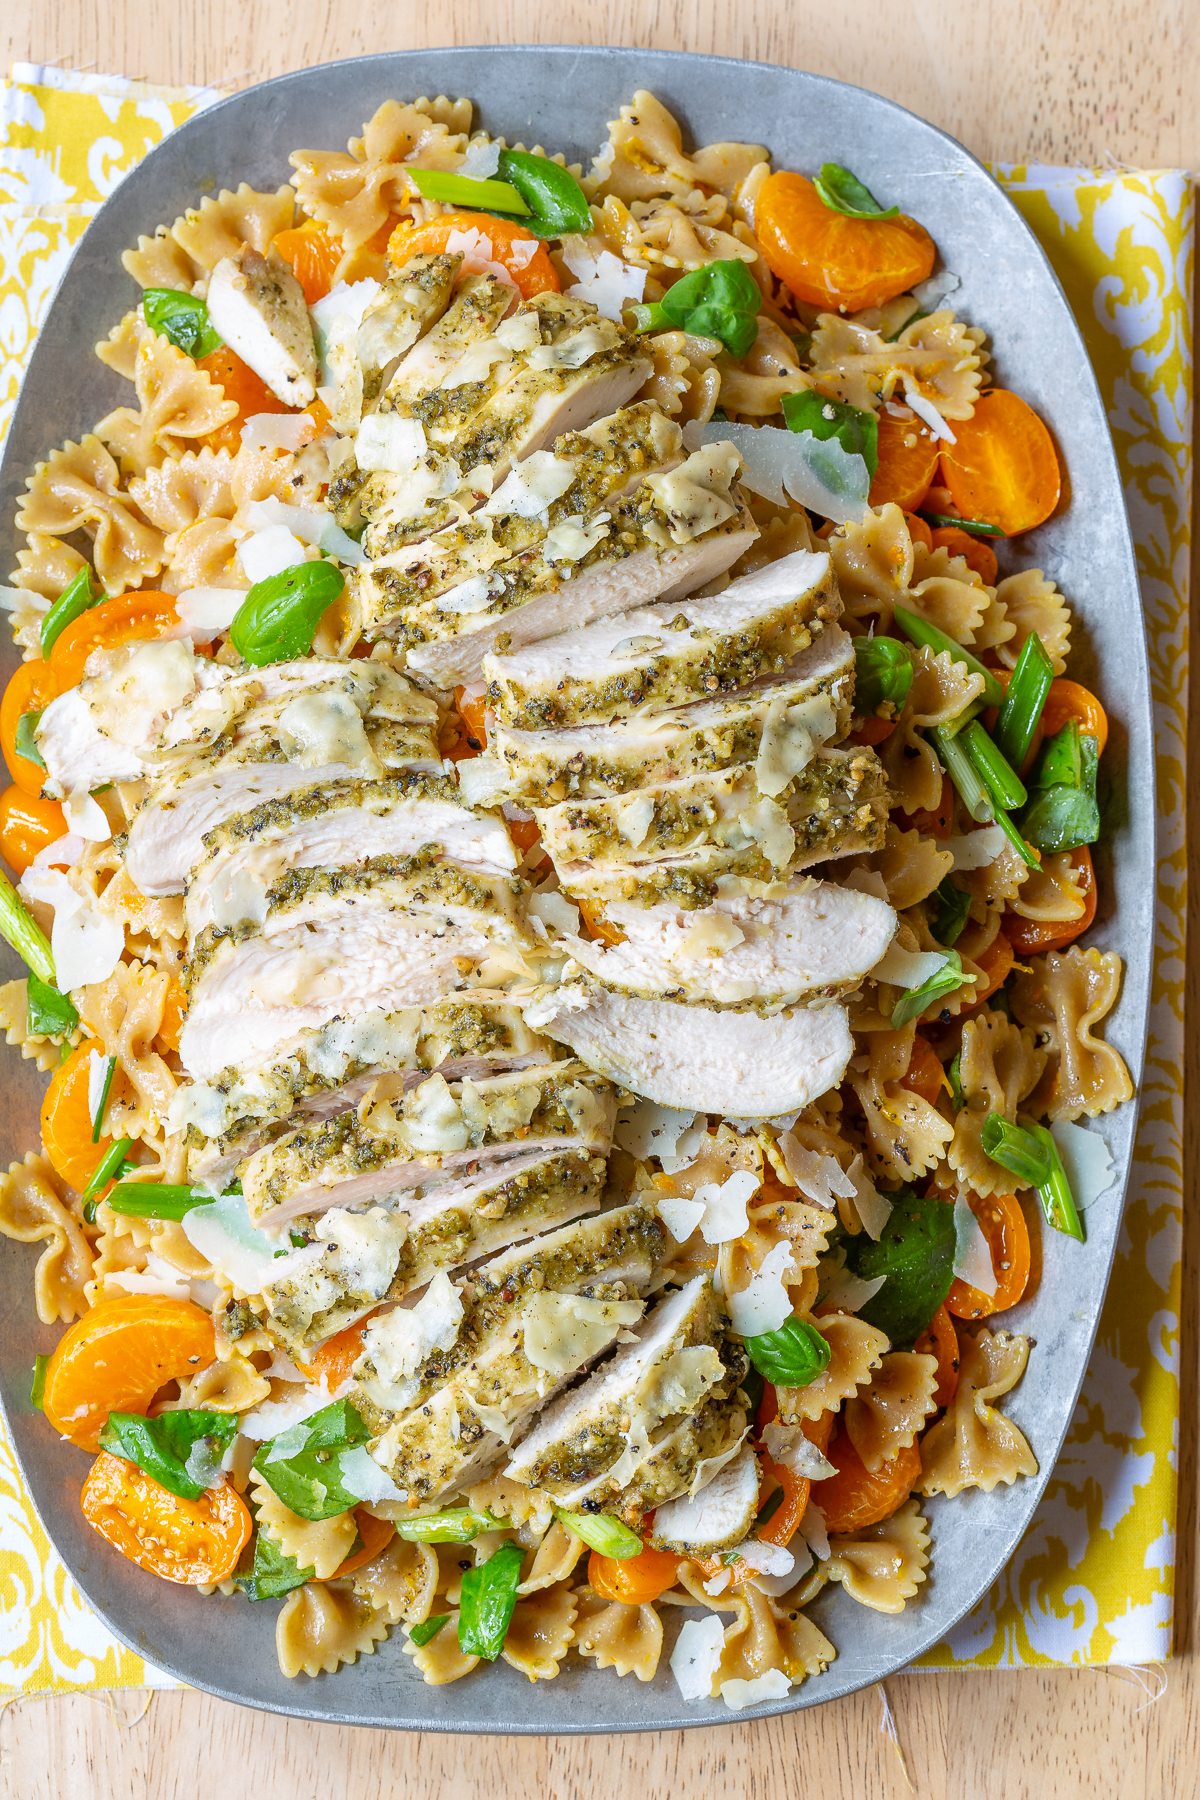 Pesto Chicken with Parmesan Crust